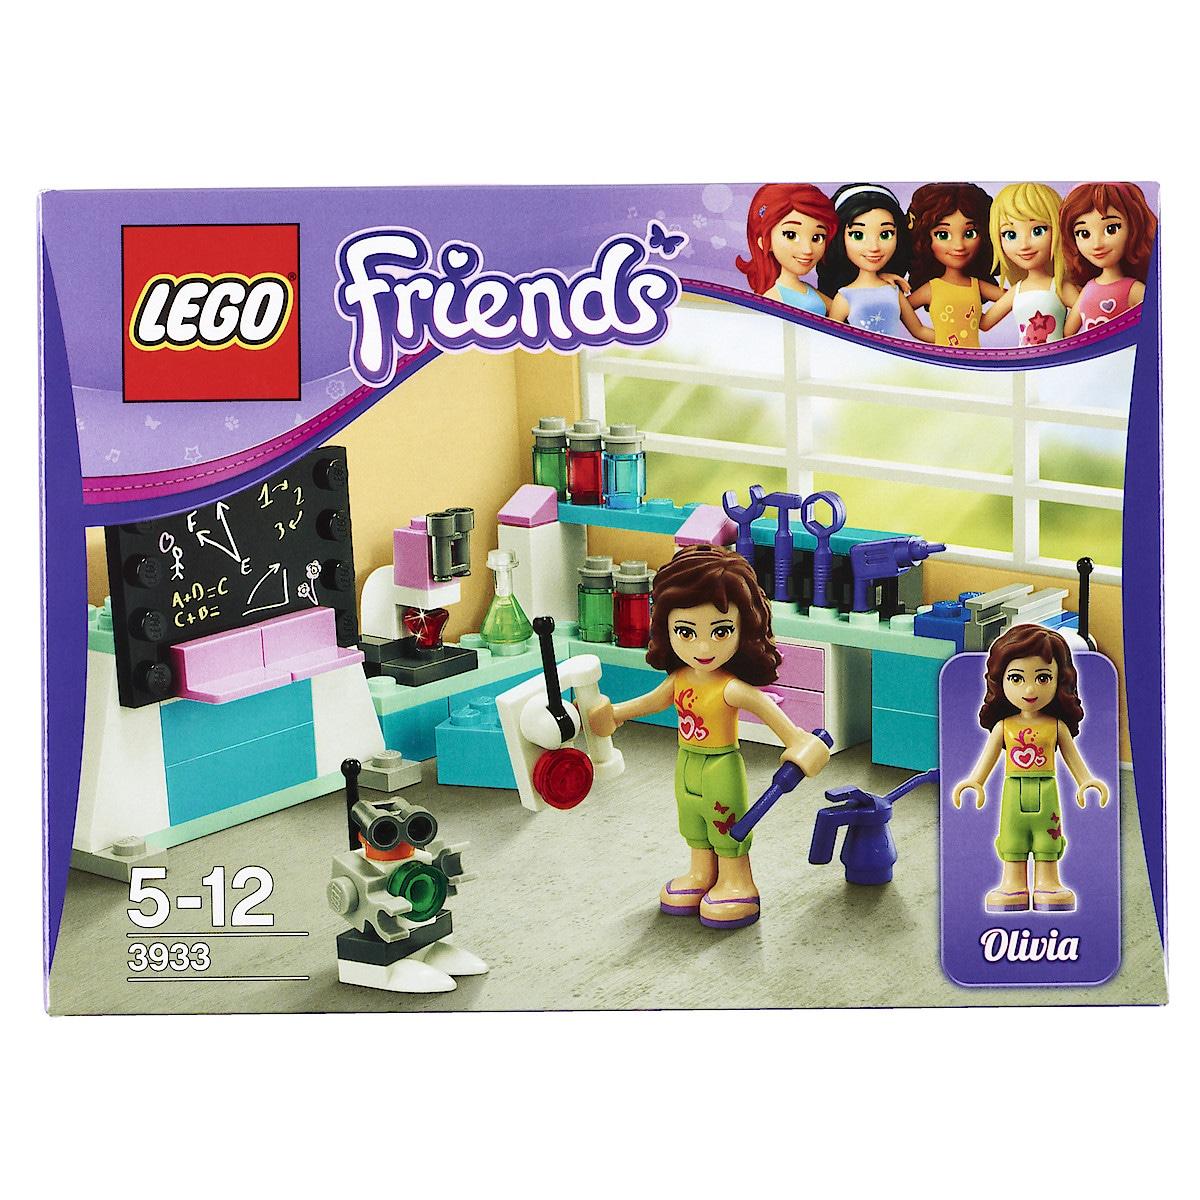 Olivian keksijäverstas 3933, Lego Friends